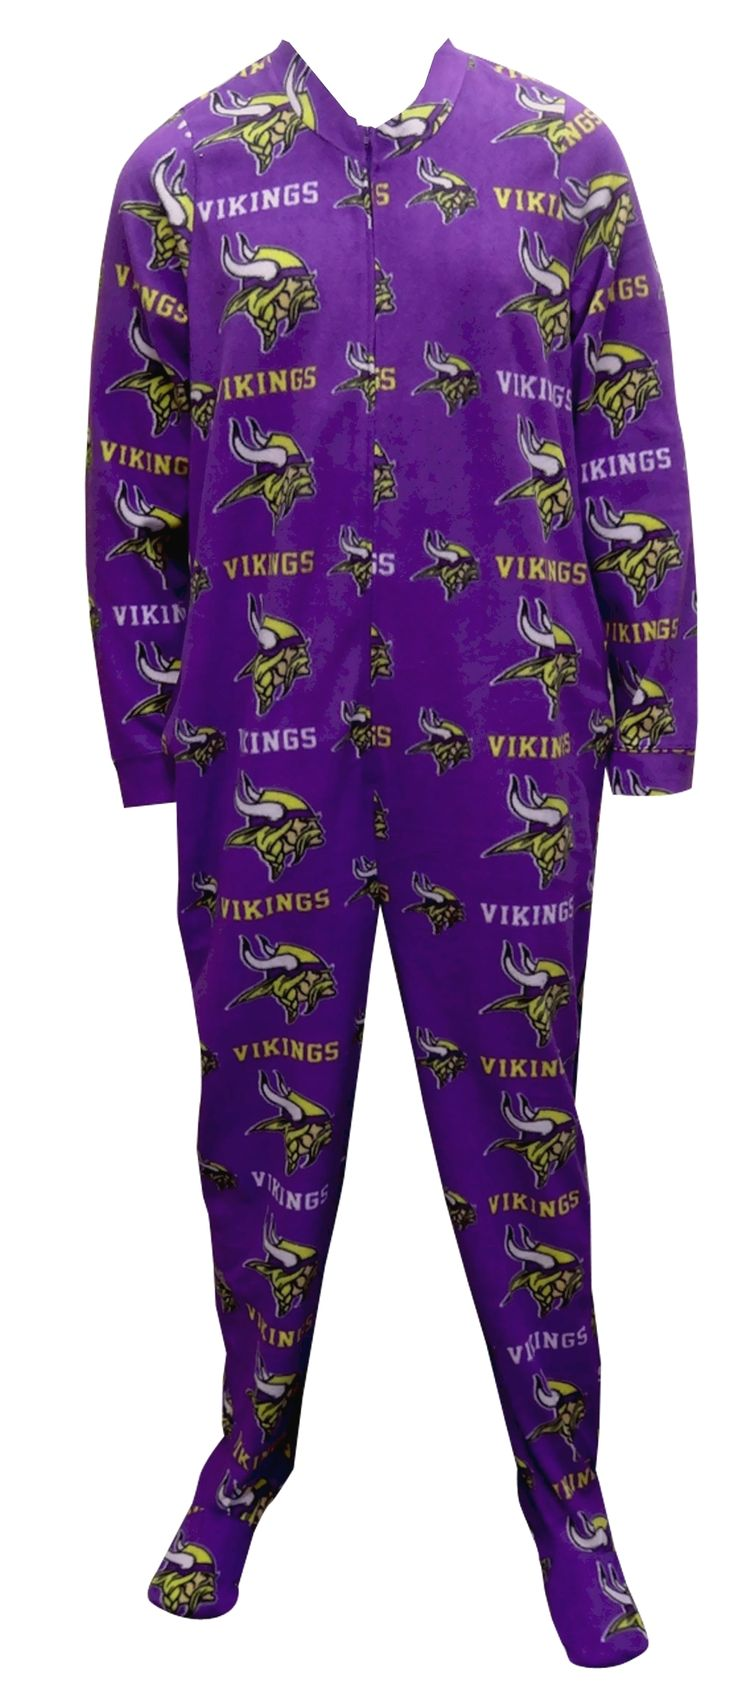 Minnesota Vikings Guys Onesie Footie Pajama Show your team spirit! This cozy microfleece footie pajama for men features the cla...